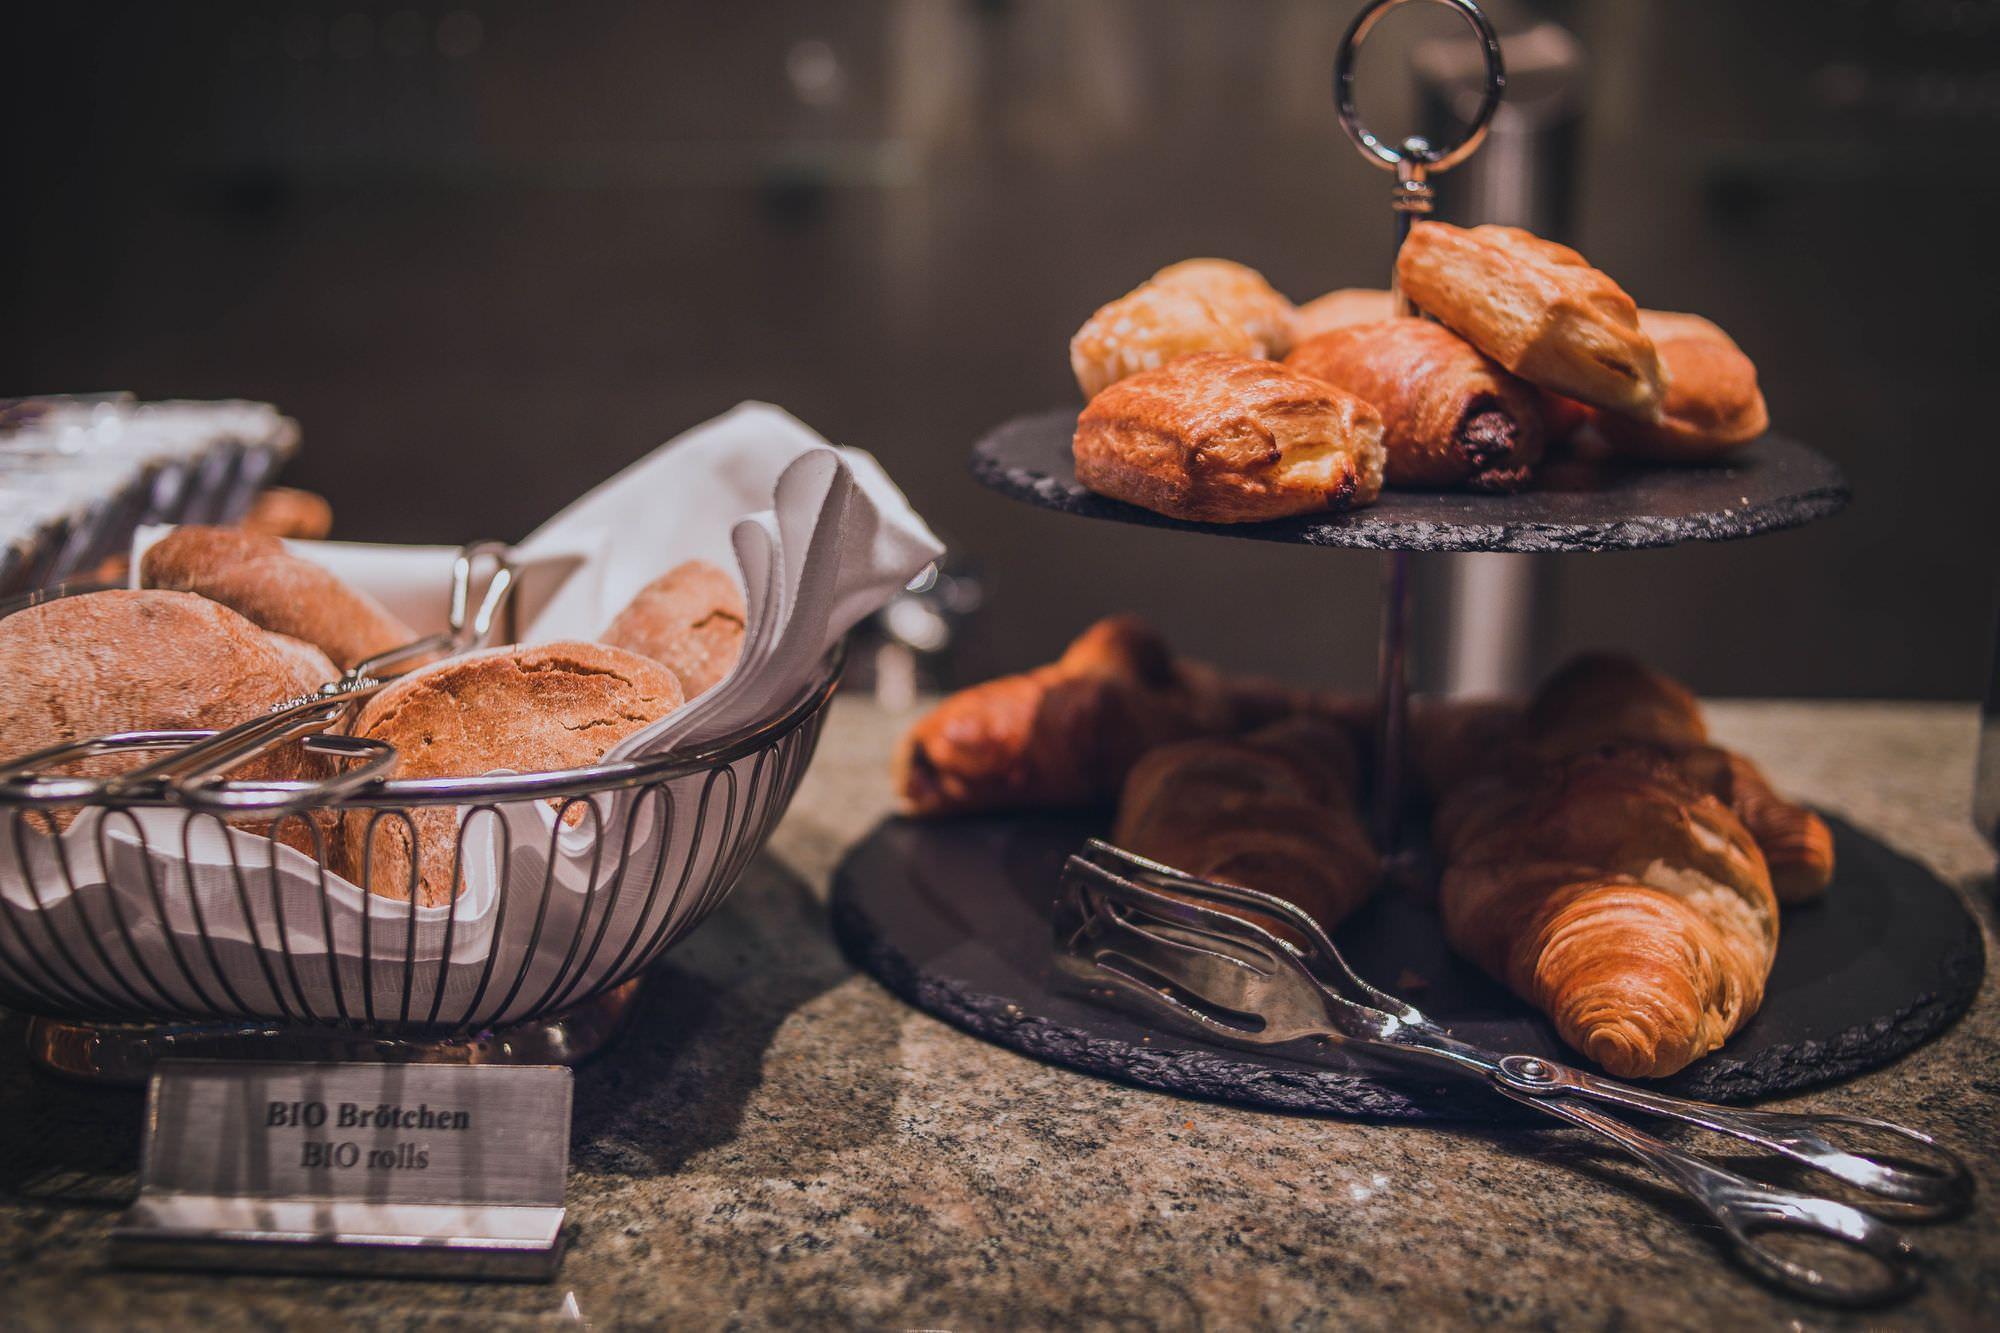 Frühstücksbuffet im Heckers Hotel / Breakfast at Heckers Hotel